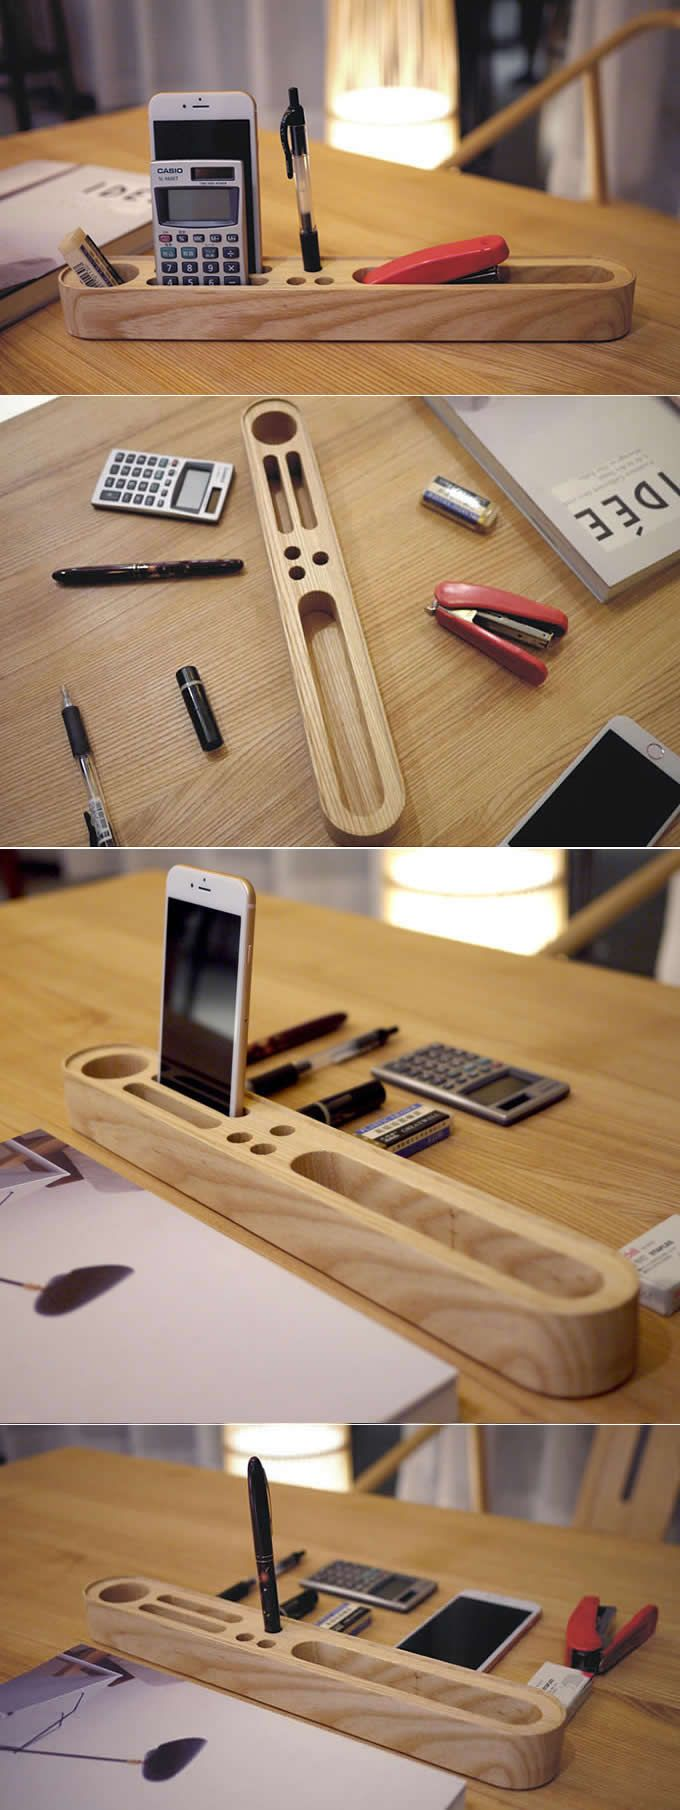 Wooden Office Supplies Desk Organizer Storage Container Phone Stand Holder  Pen Pencil Business Cards Holder To Organizer Your Office Supplies ( Furniture ...